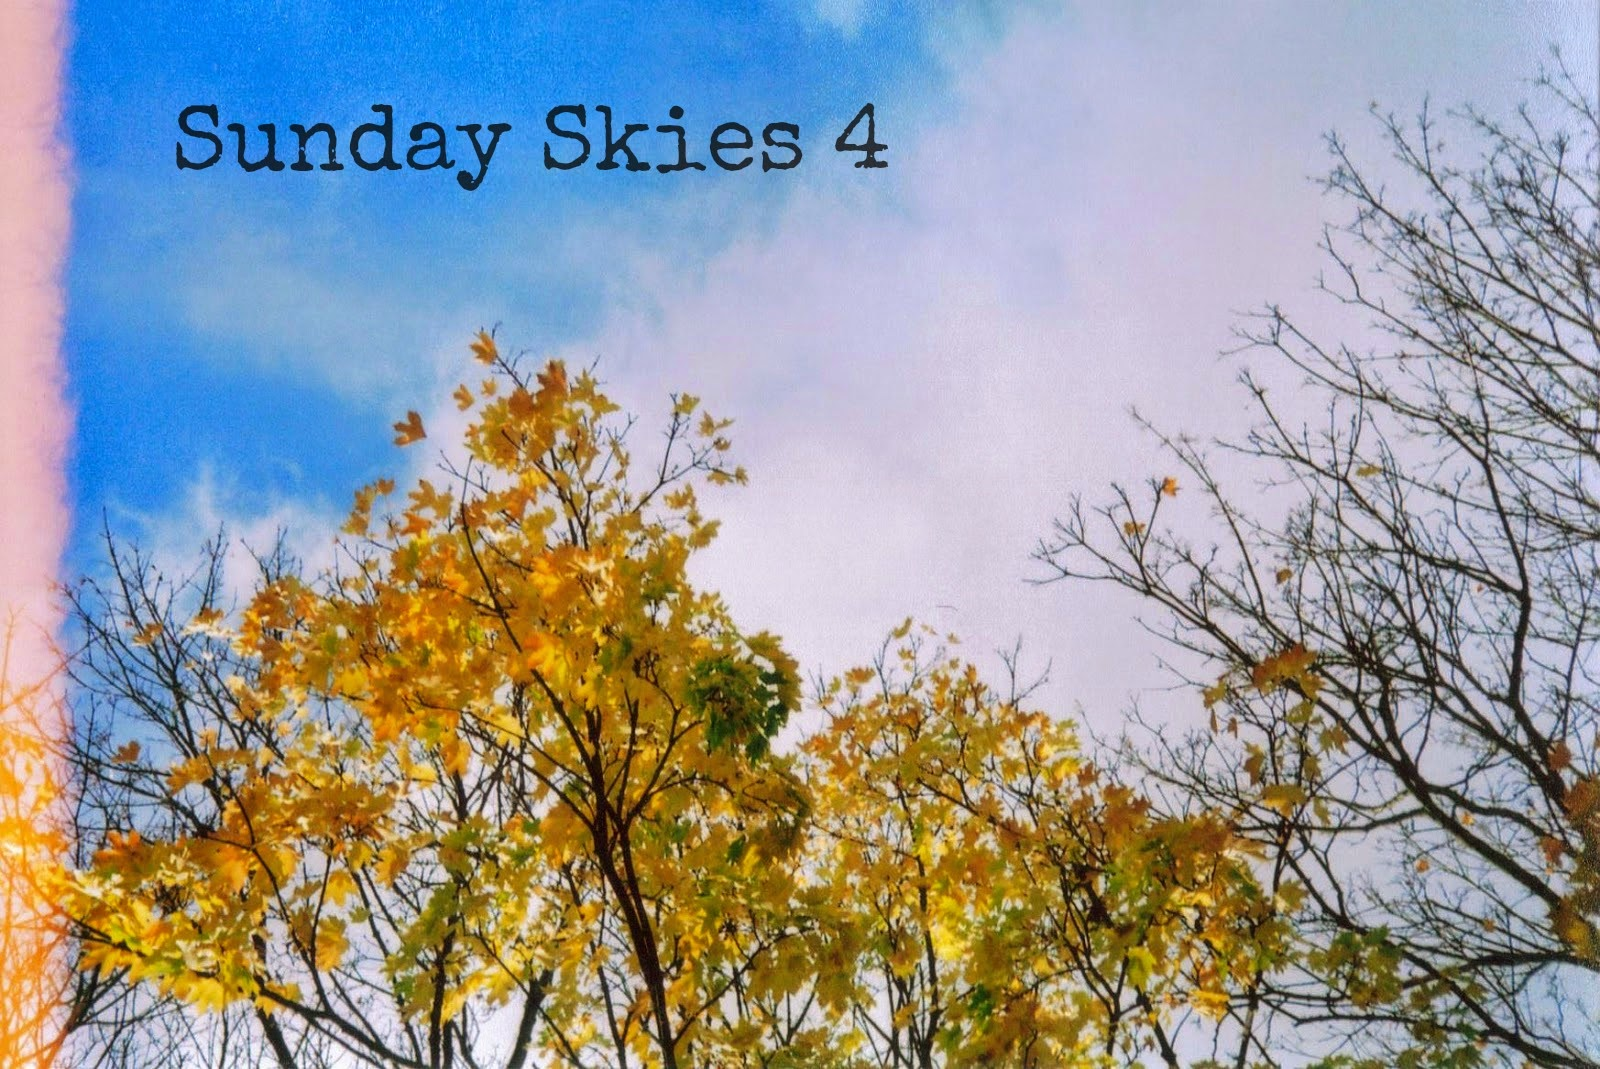 http://talesonfilm.blogspot.co.uk/2014/04/sunday-skies_13.html